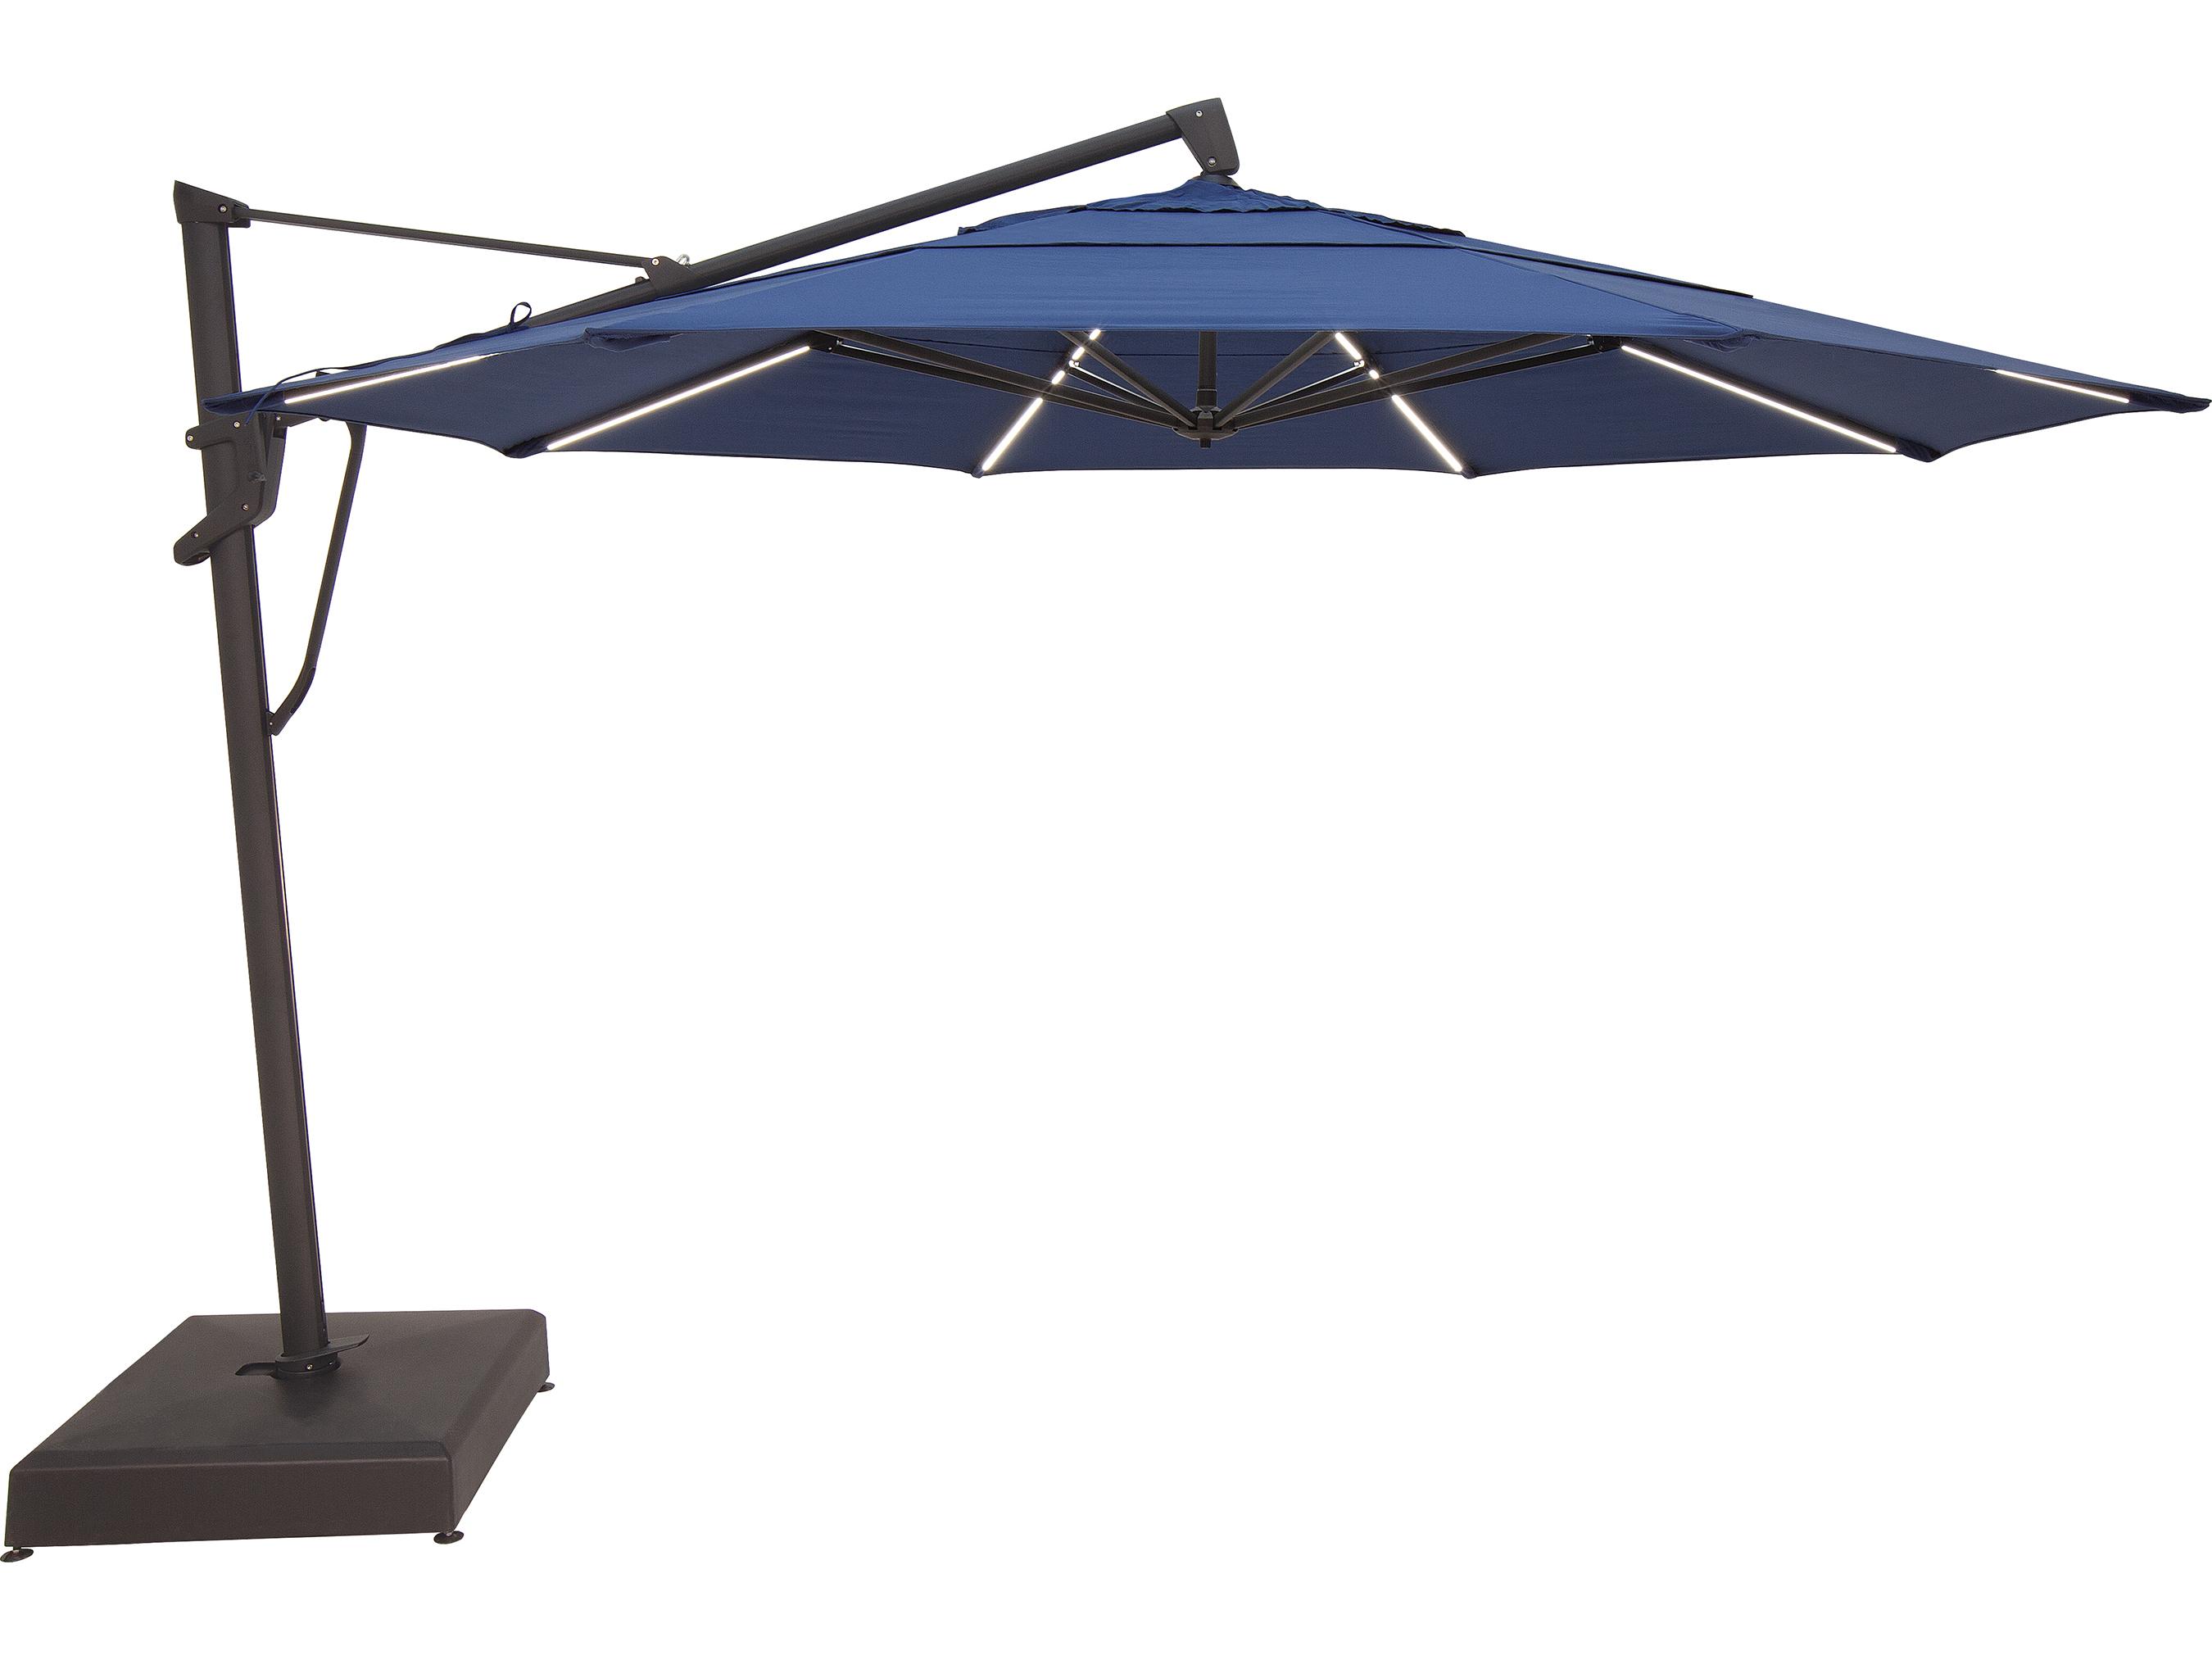 Treasure garden cantilever 13 foot akzplx plus starlux octagon crank lift tilt and lock umbrella for Treasure garden cantilever umbrella 13